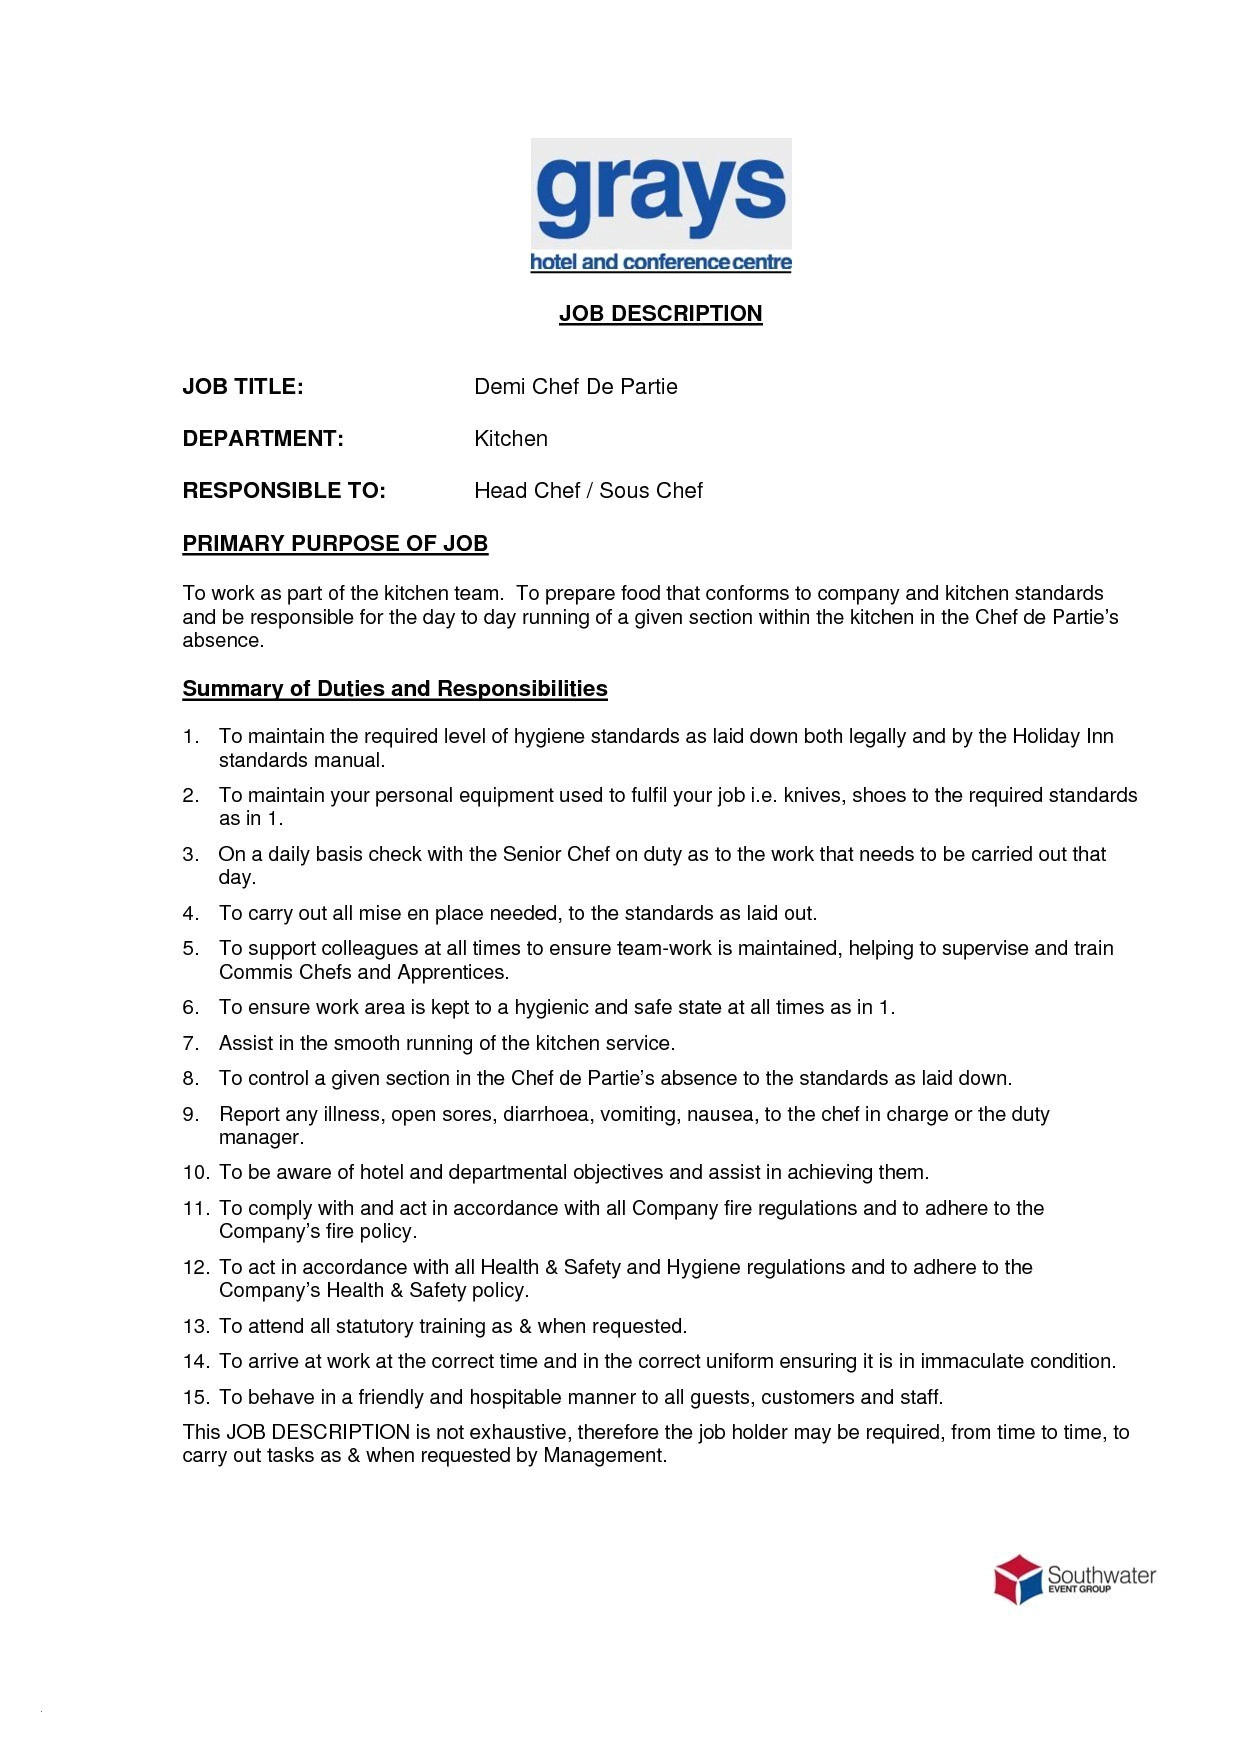 sample resume of chef de partie valid sous chef job description resume elegant jd templates pastry chef